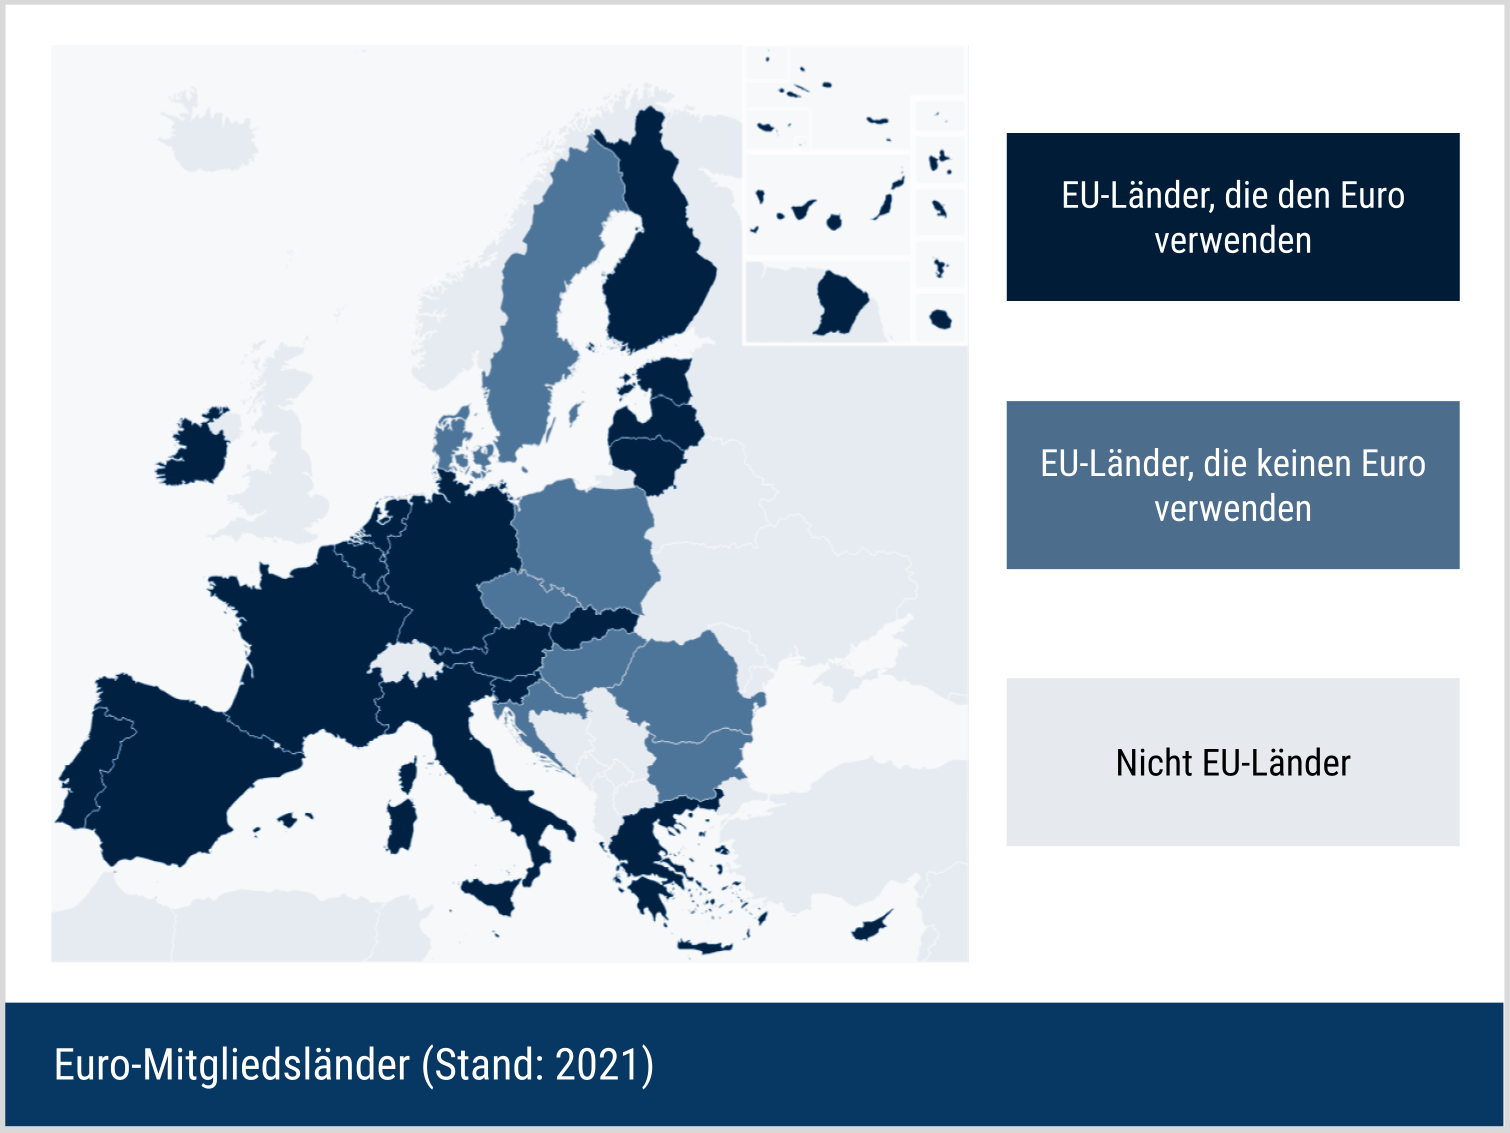 Euro-Mitgliedsländer